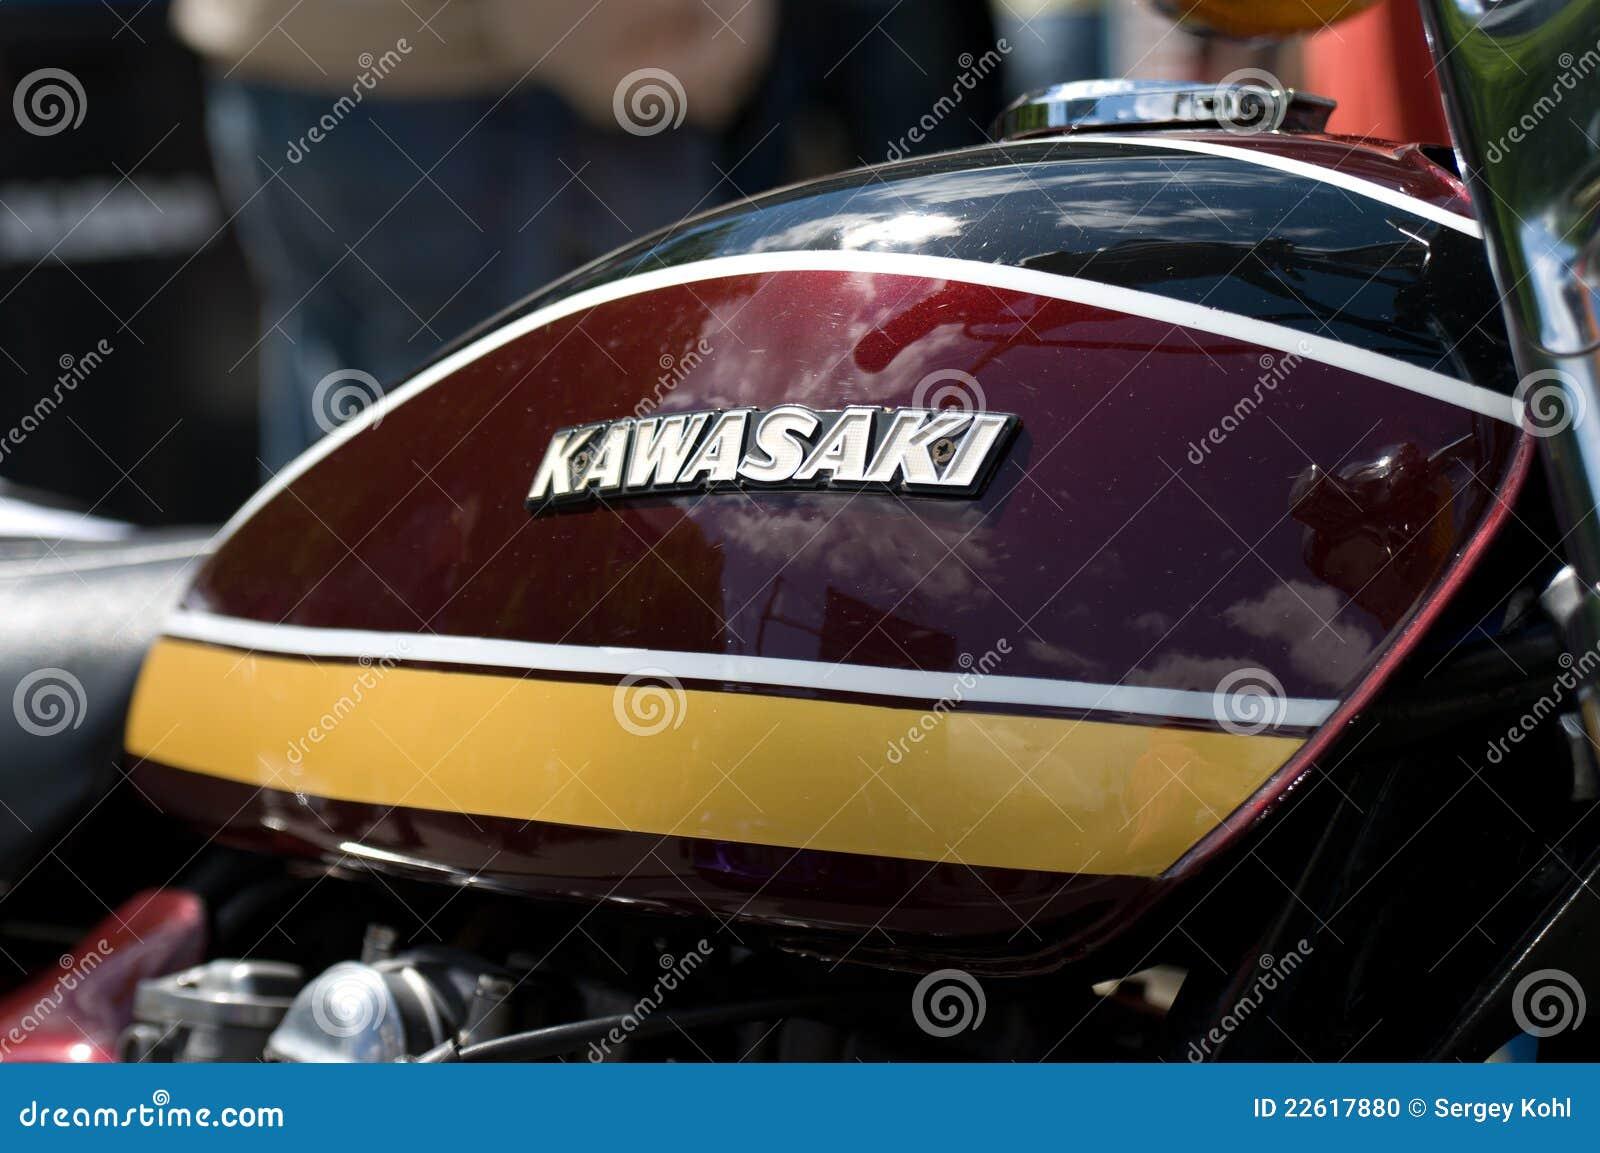 Kawasaki Zephyr Fuel Tank